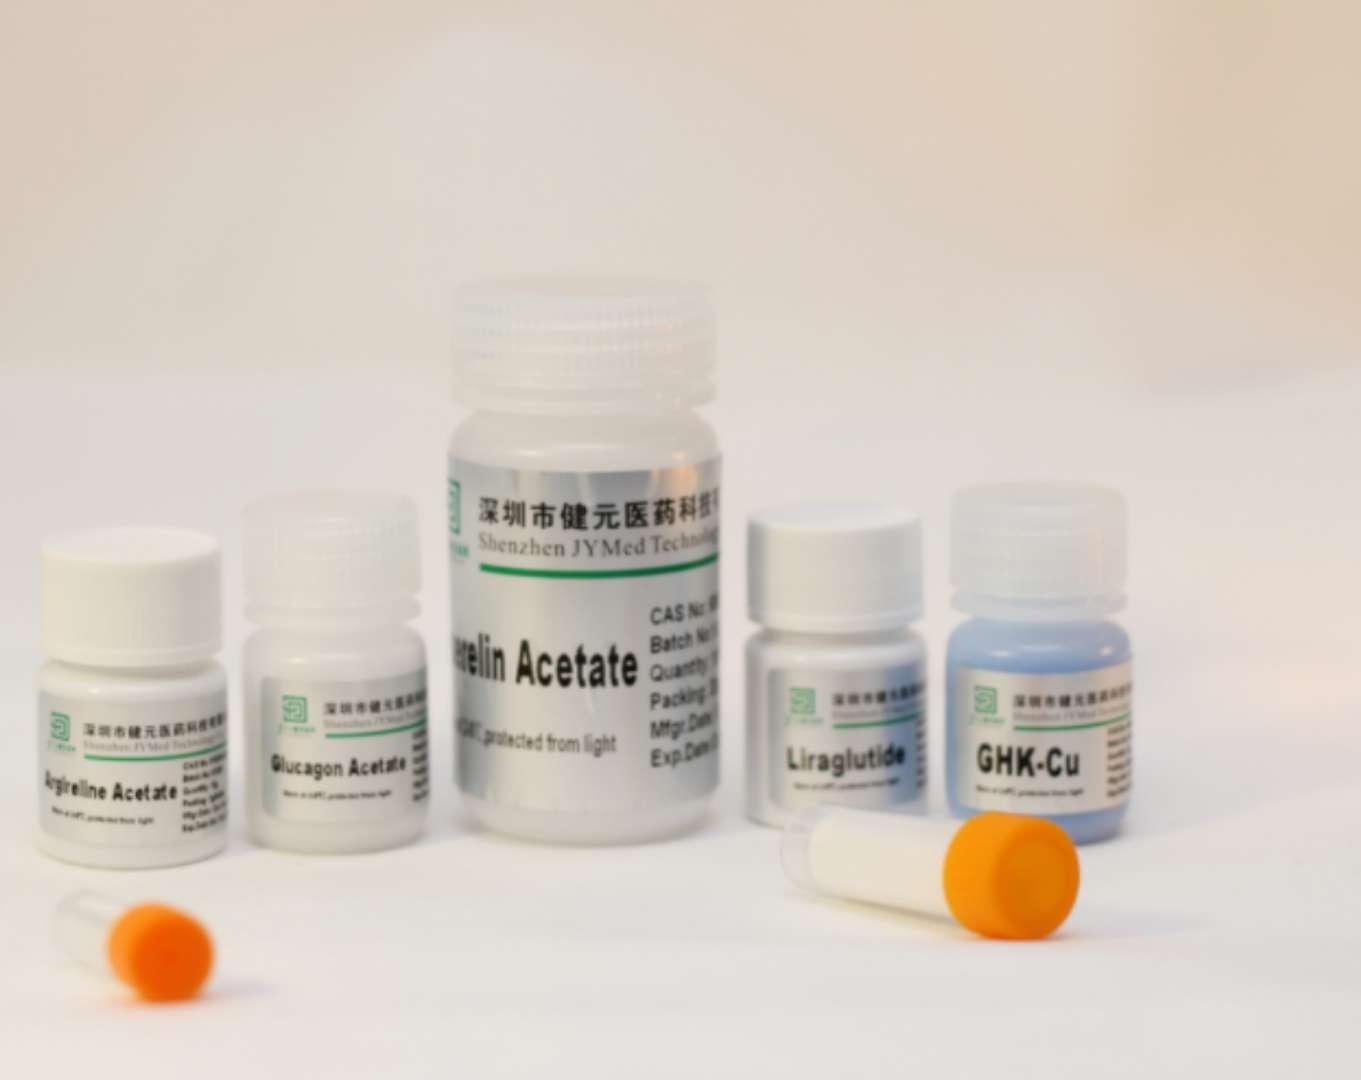 Desmopressin Acetate/Health and Medical